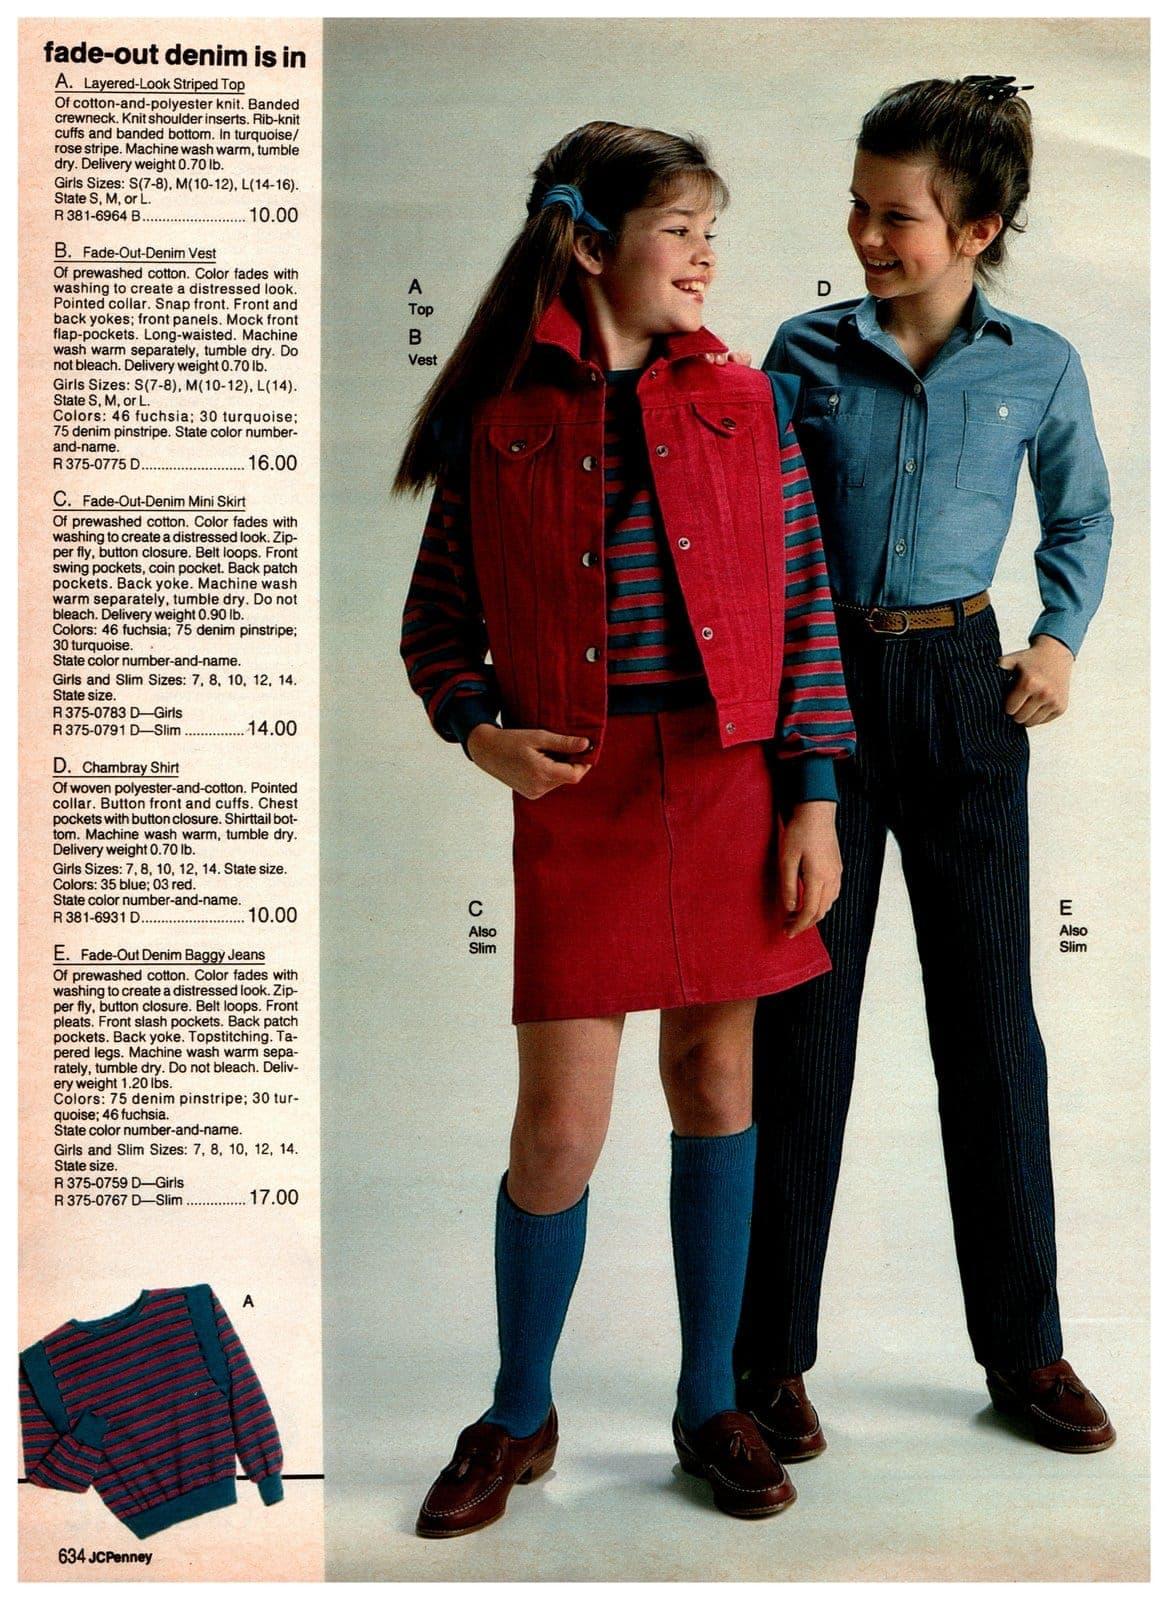 Layered-look striped top, denim vests, denim miniskirt, chambray skirt and denim baggy jeans